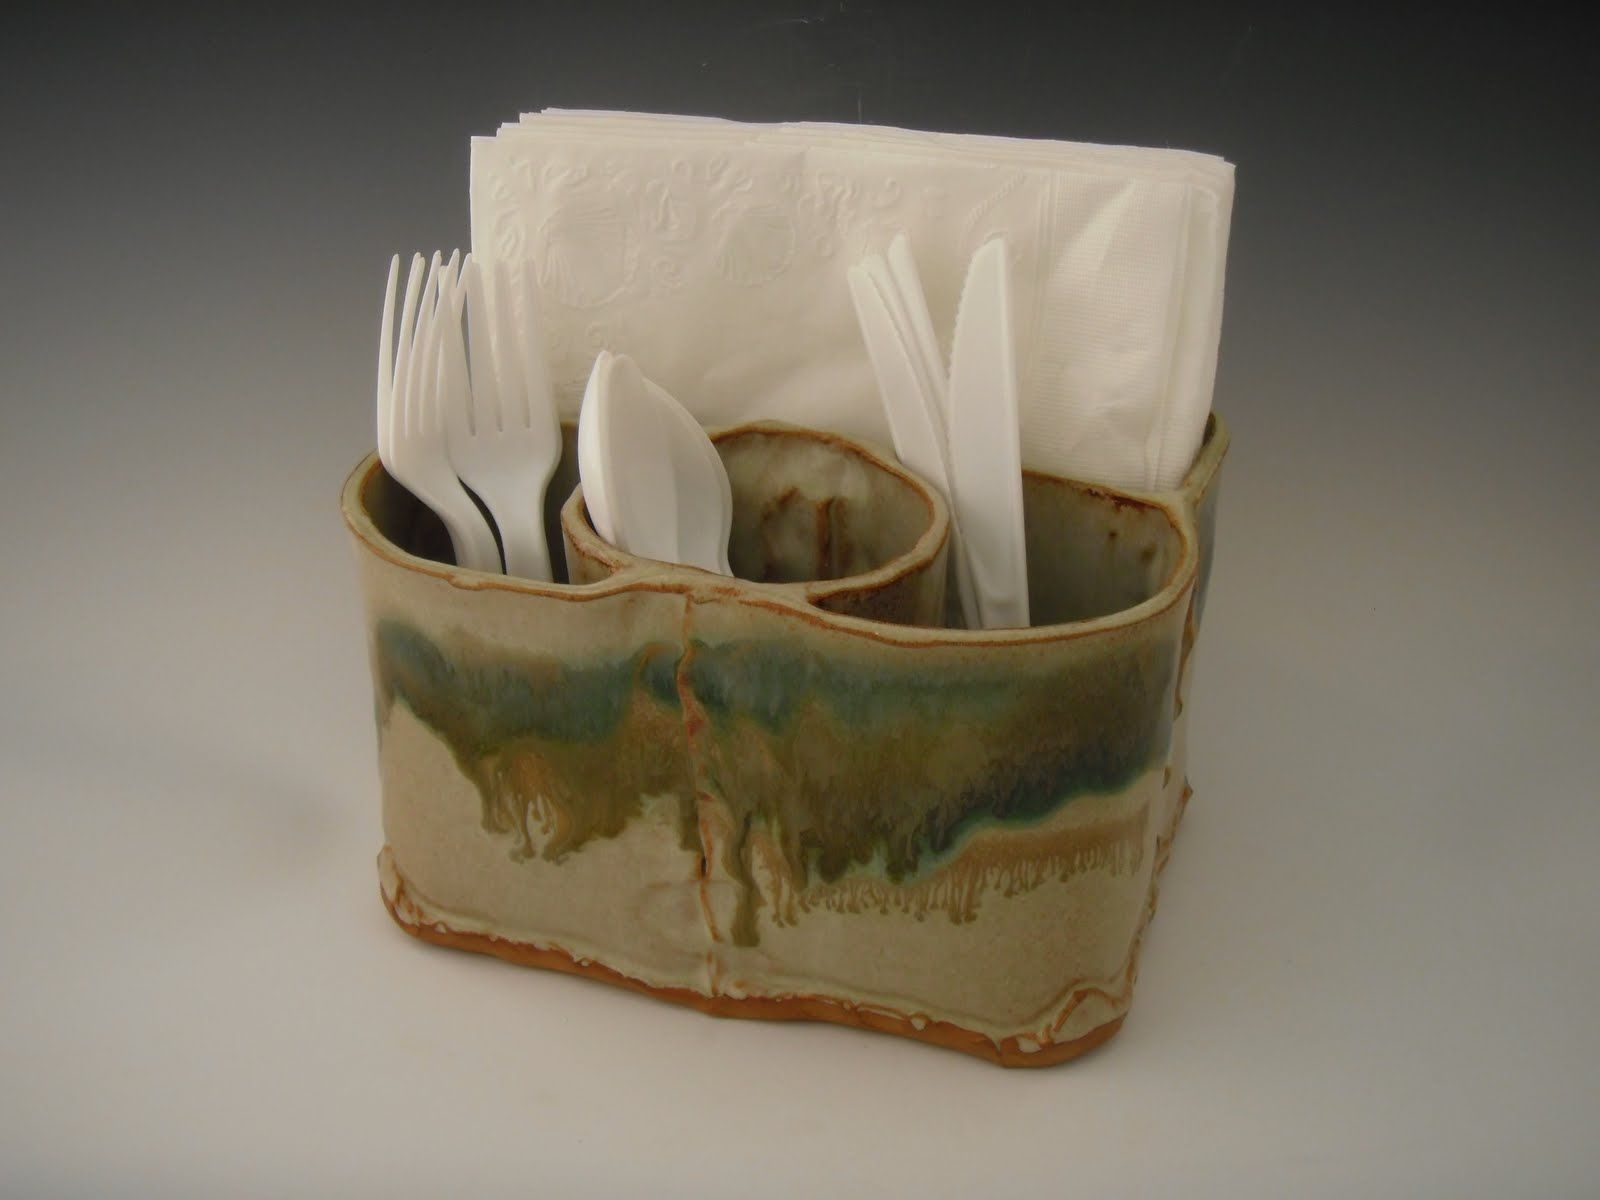 kitchen utensil caddy small table for ceramic napkin holder - google search | slabs pinterest ...